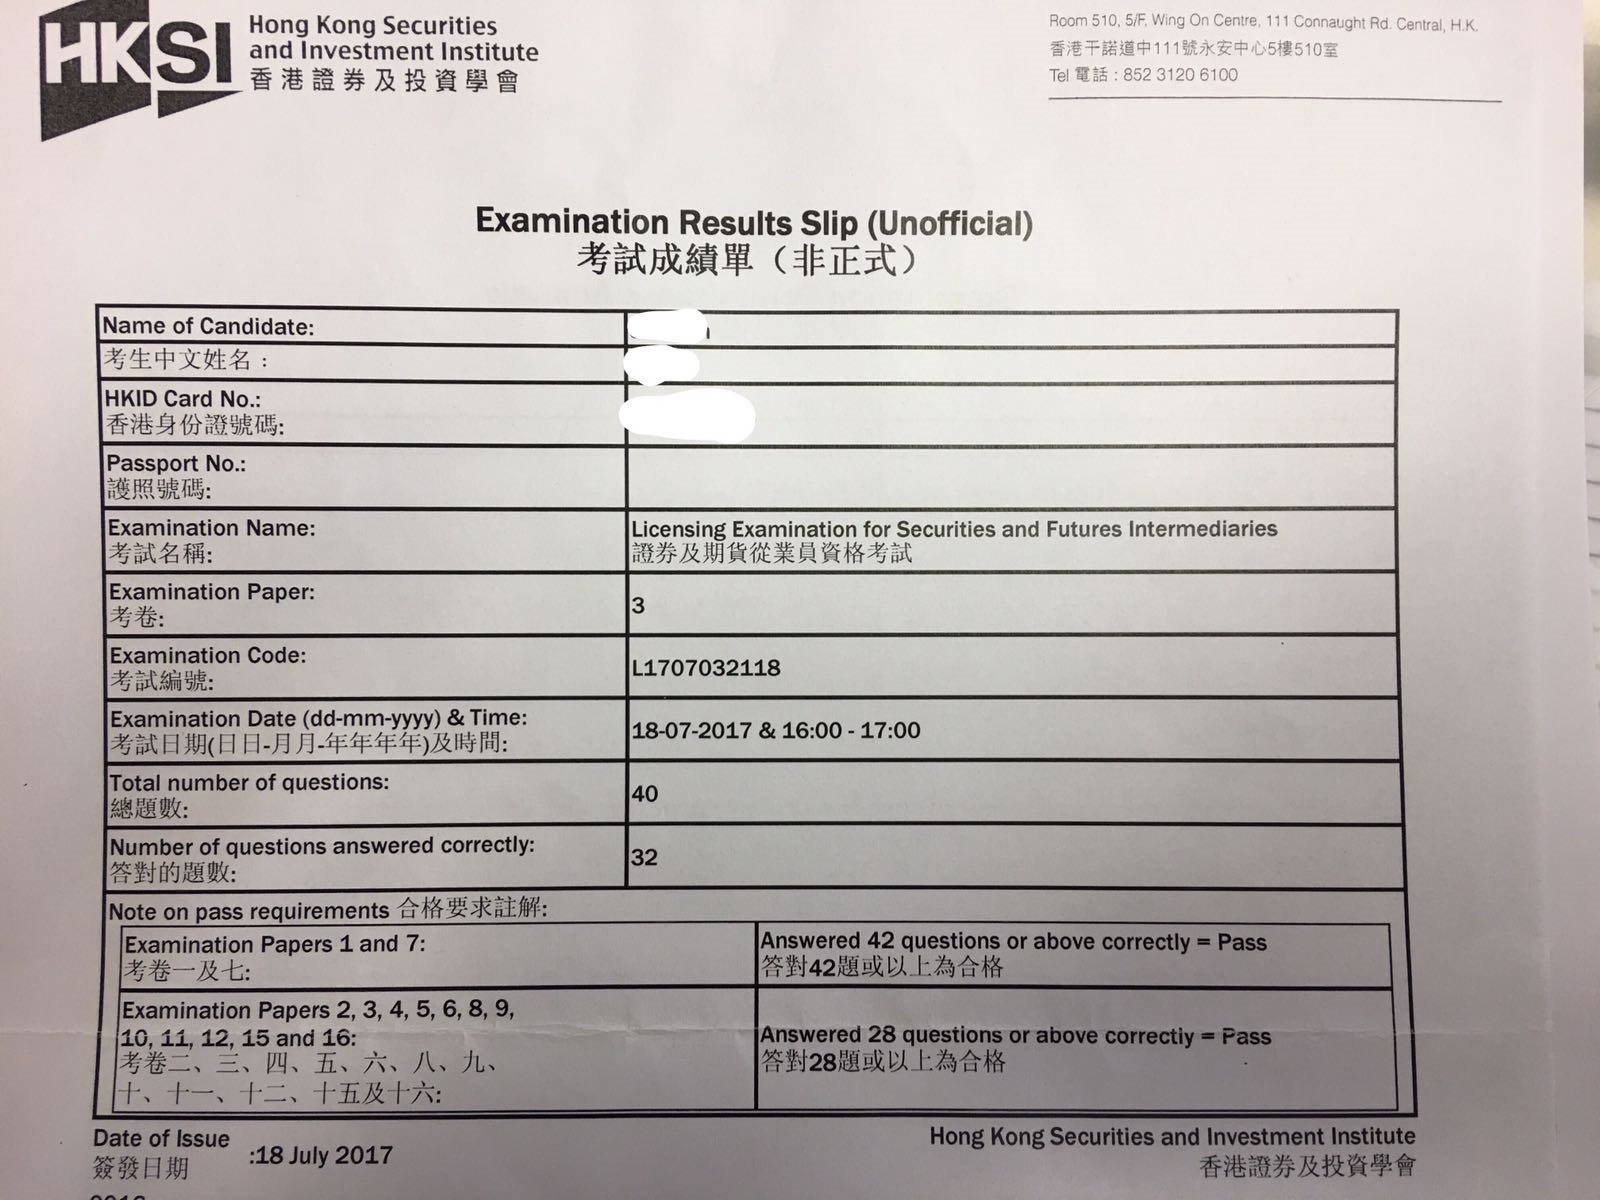 TS 18/7/2017 LE Paper 3 證券期貨從業員資格考試卷三 Pass